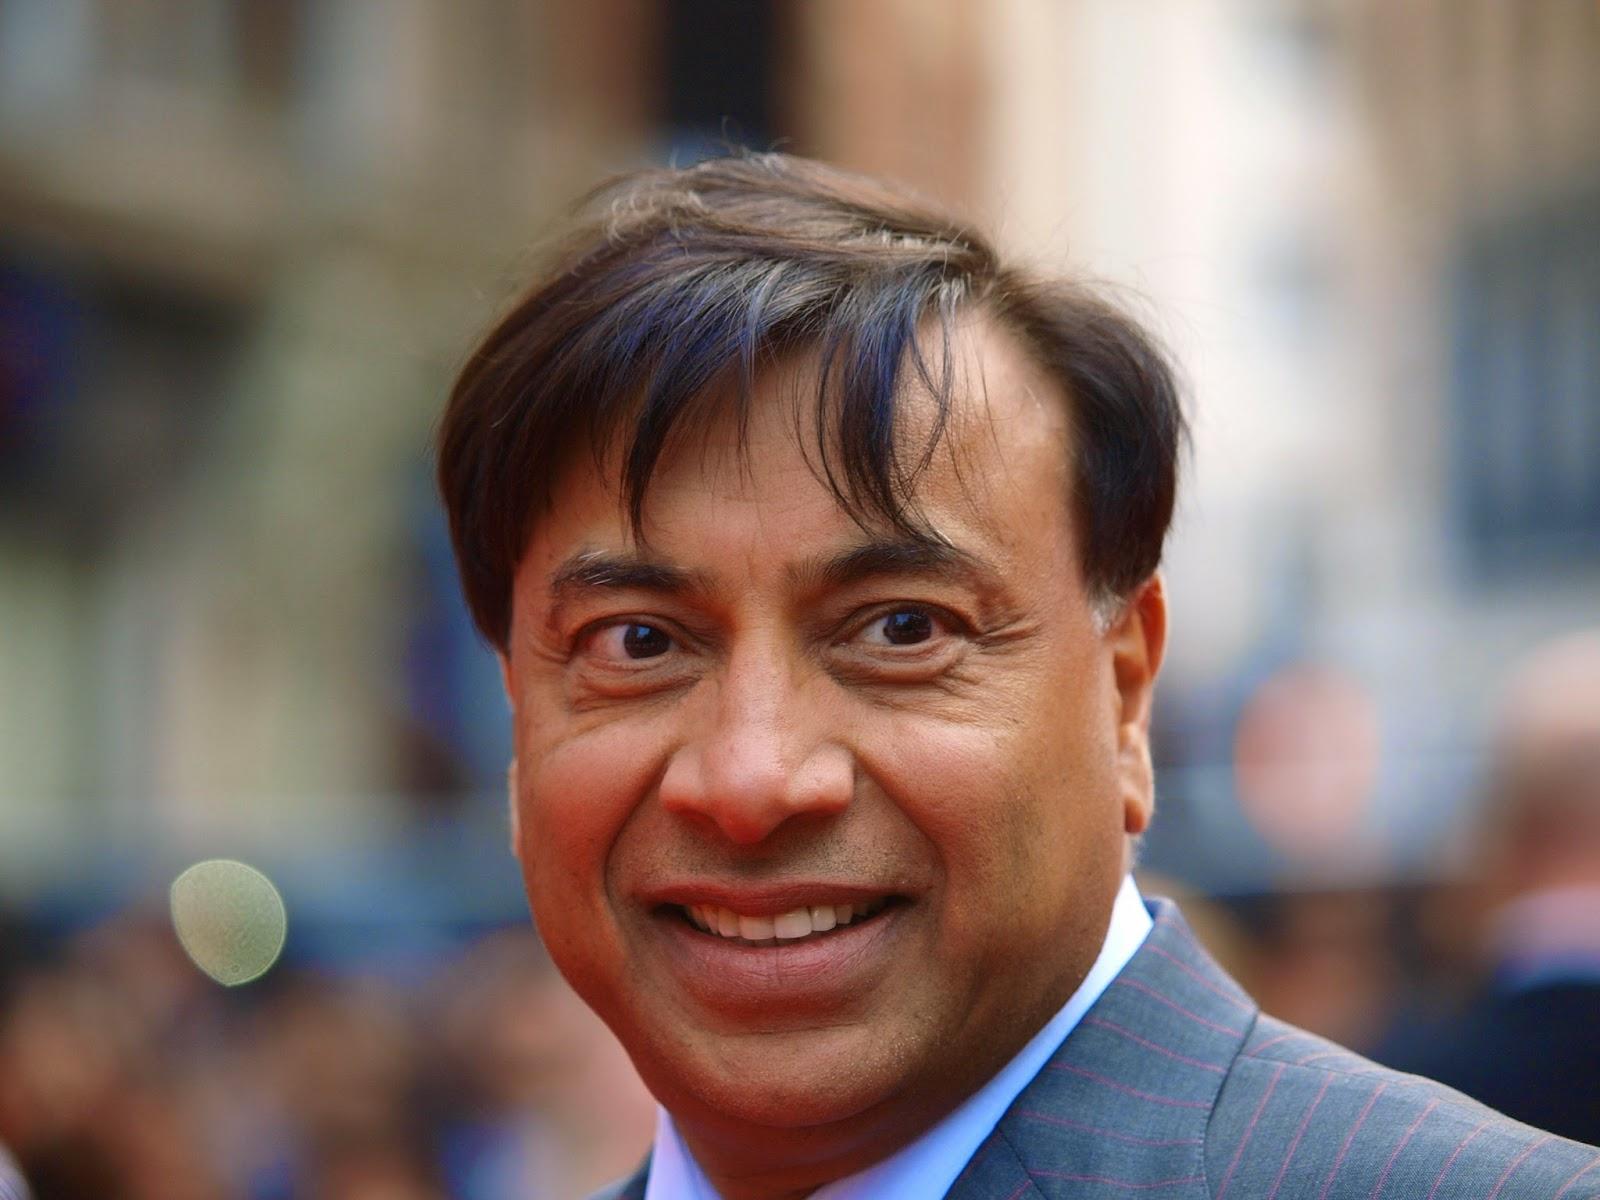 "<img src=""http://1.bp.blogspot.com/-amUtG8puS5A/U4dkKe4SofI/AAAAAAAAACM/Zp18kPH6YCA/s1600/Lakshmi-Mittal-richest-man-in-india.jpg"" alt=""RICHEST MAN IN INDIA"" />"